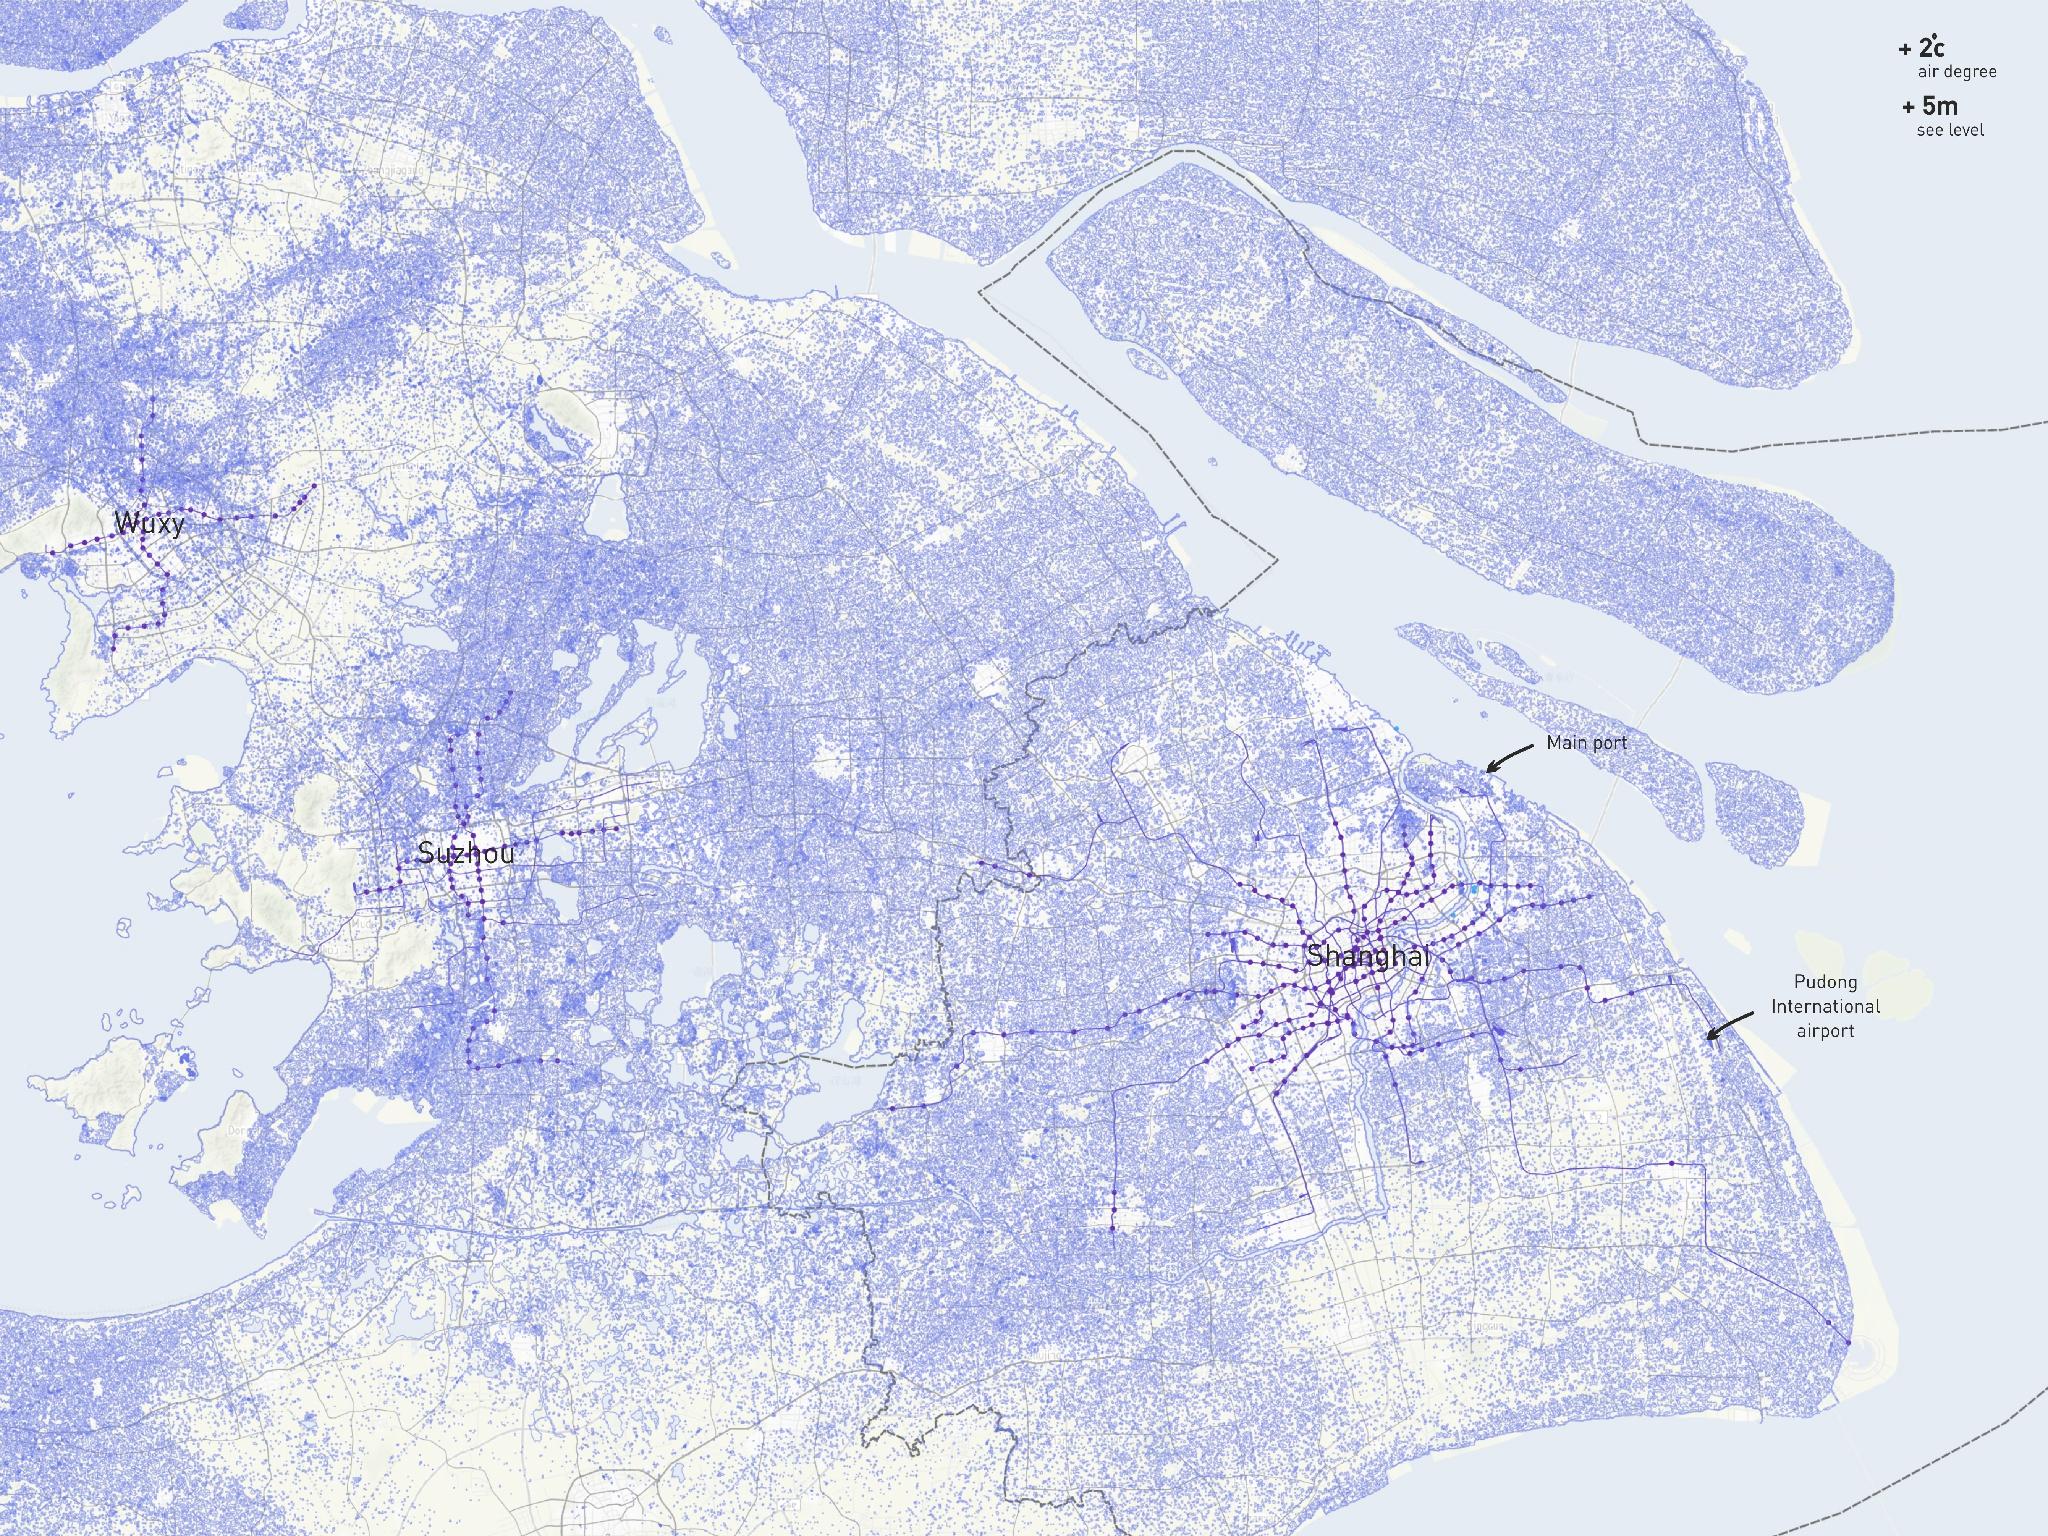 Shanghai_global-warming-010